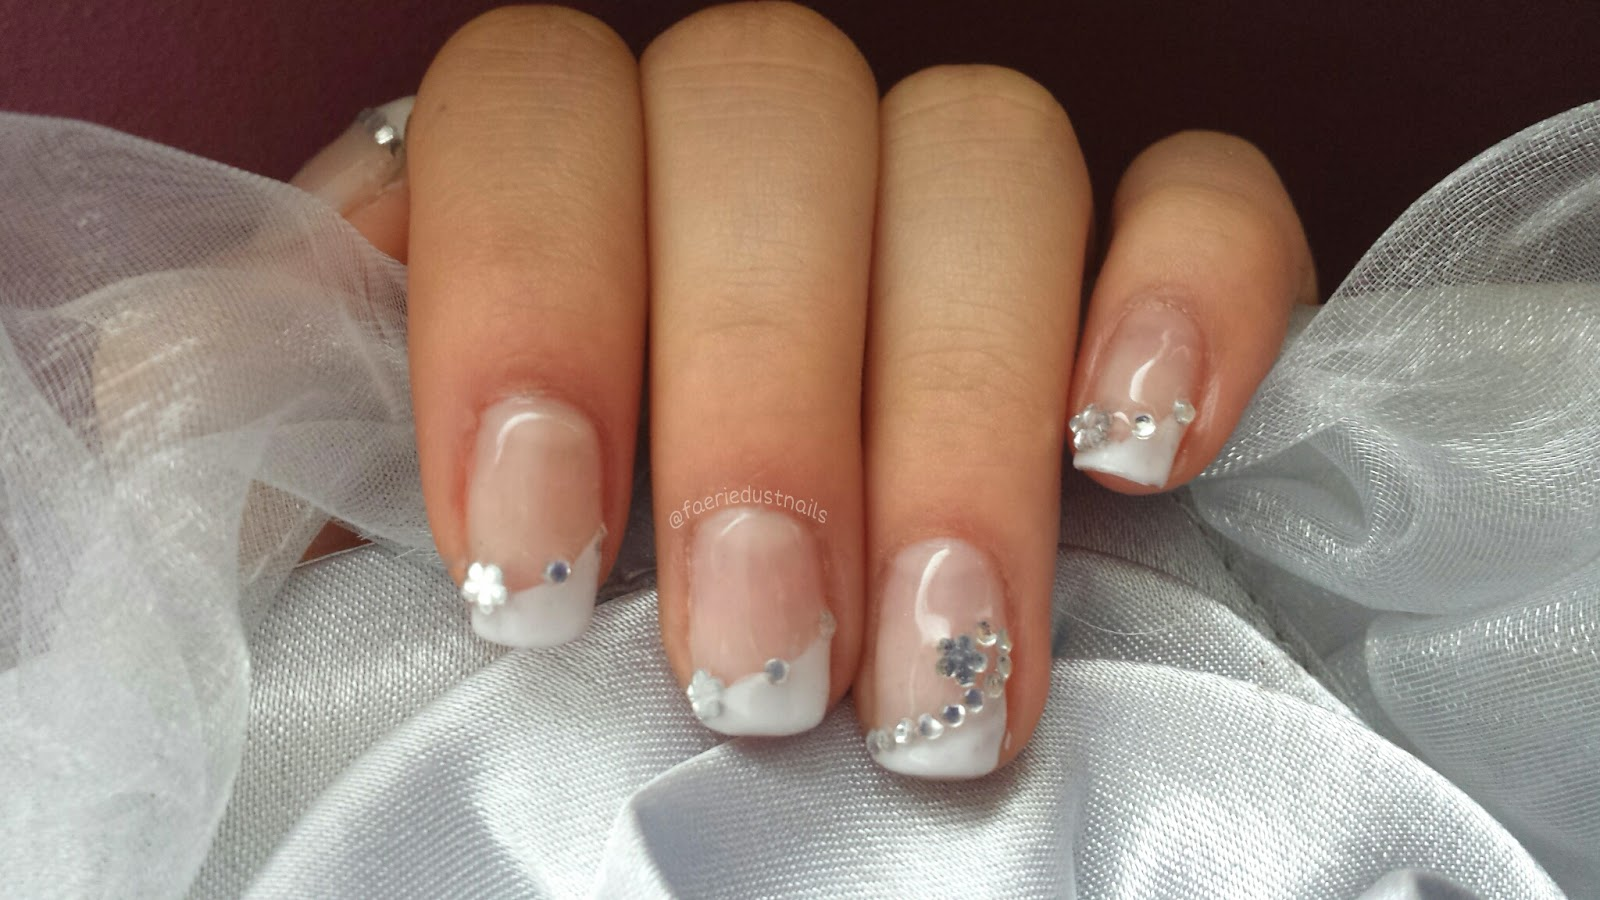 FaerieDust Nails: Prom Nails: Diagonal French Design